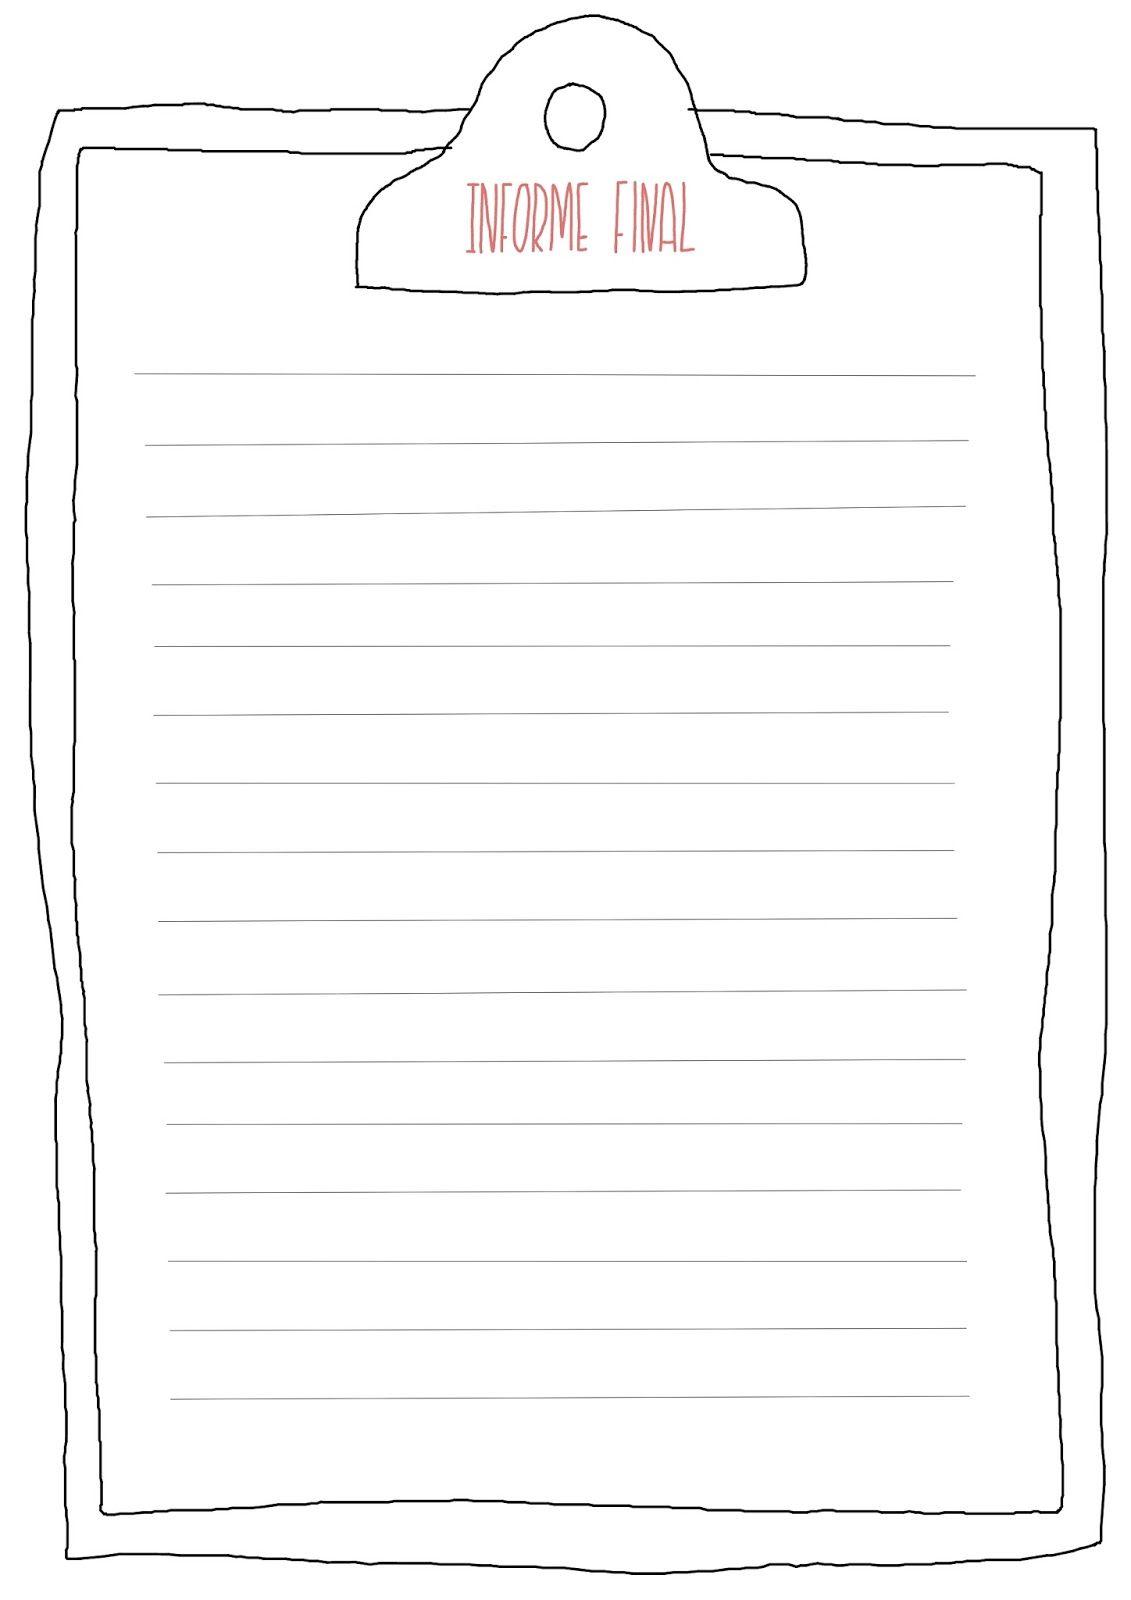 Diario personal para descargar gratis. Imprimibles gratis